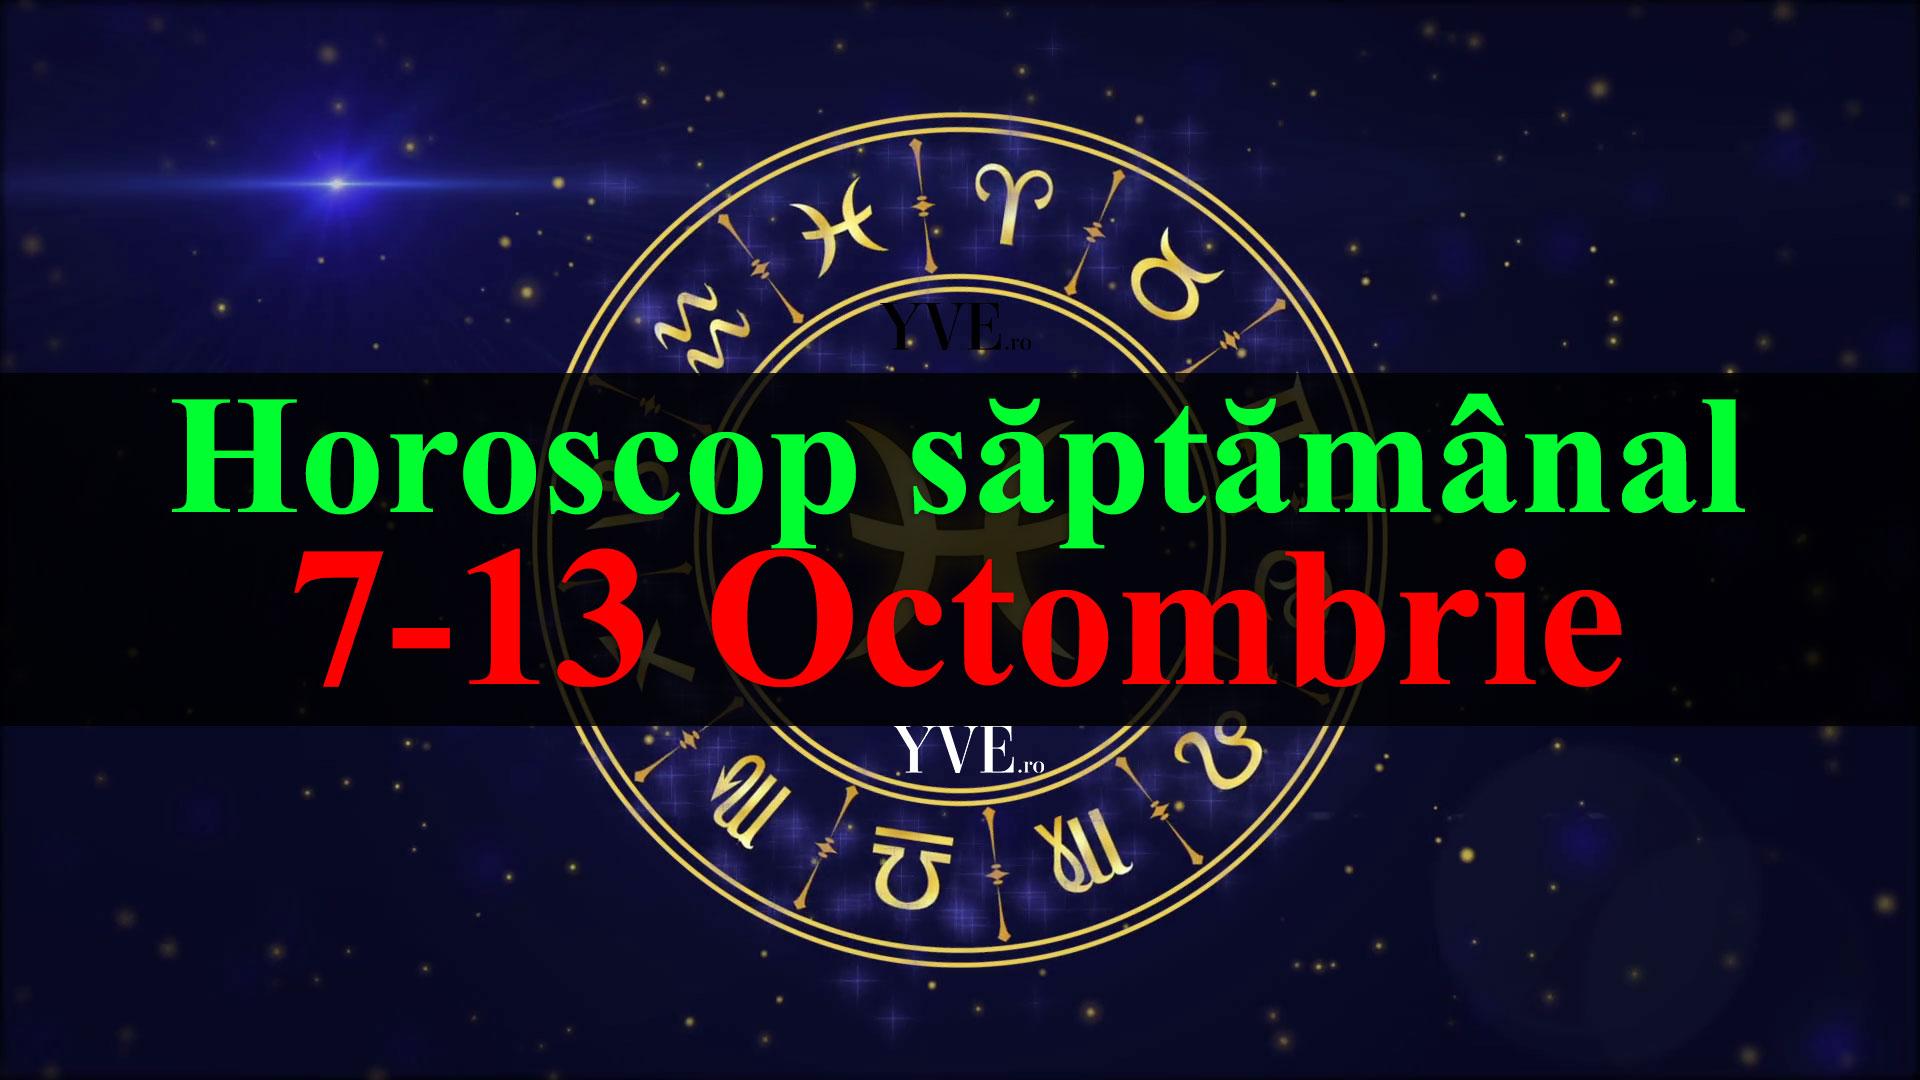 Horoscop saptamanal 7-13 Octombrie 2019